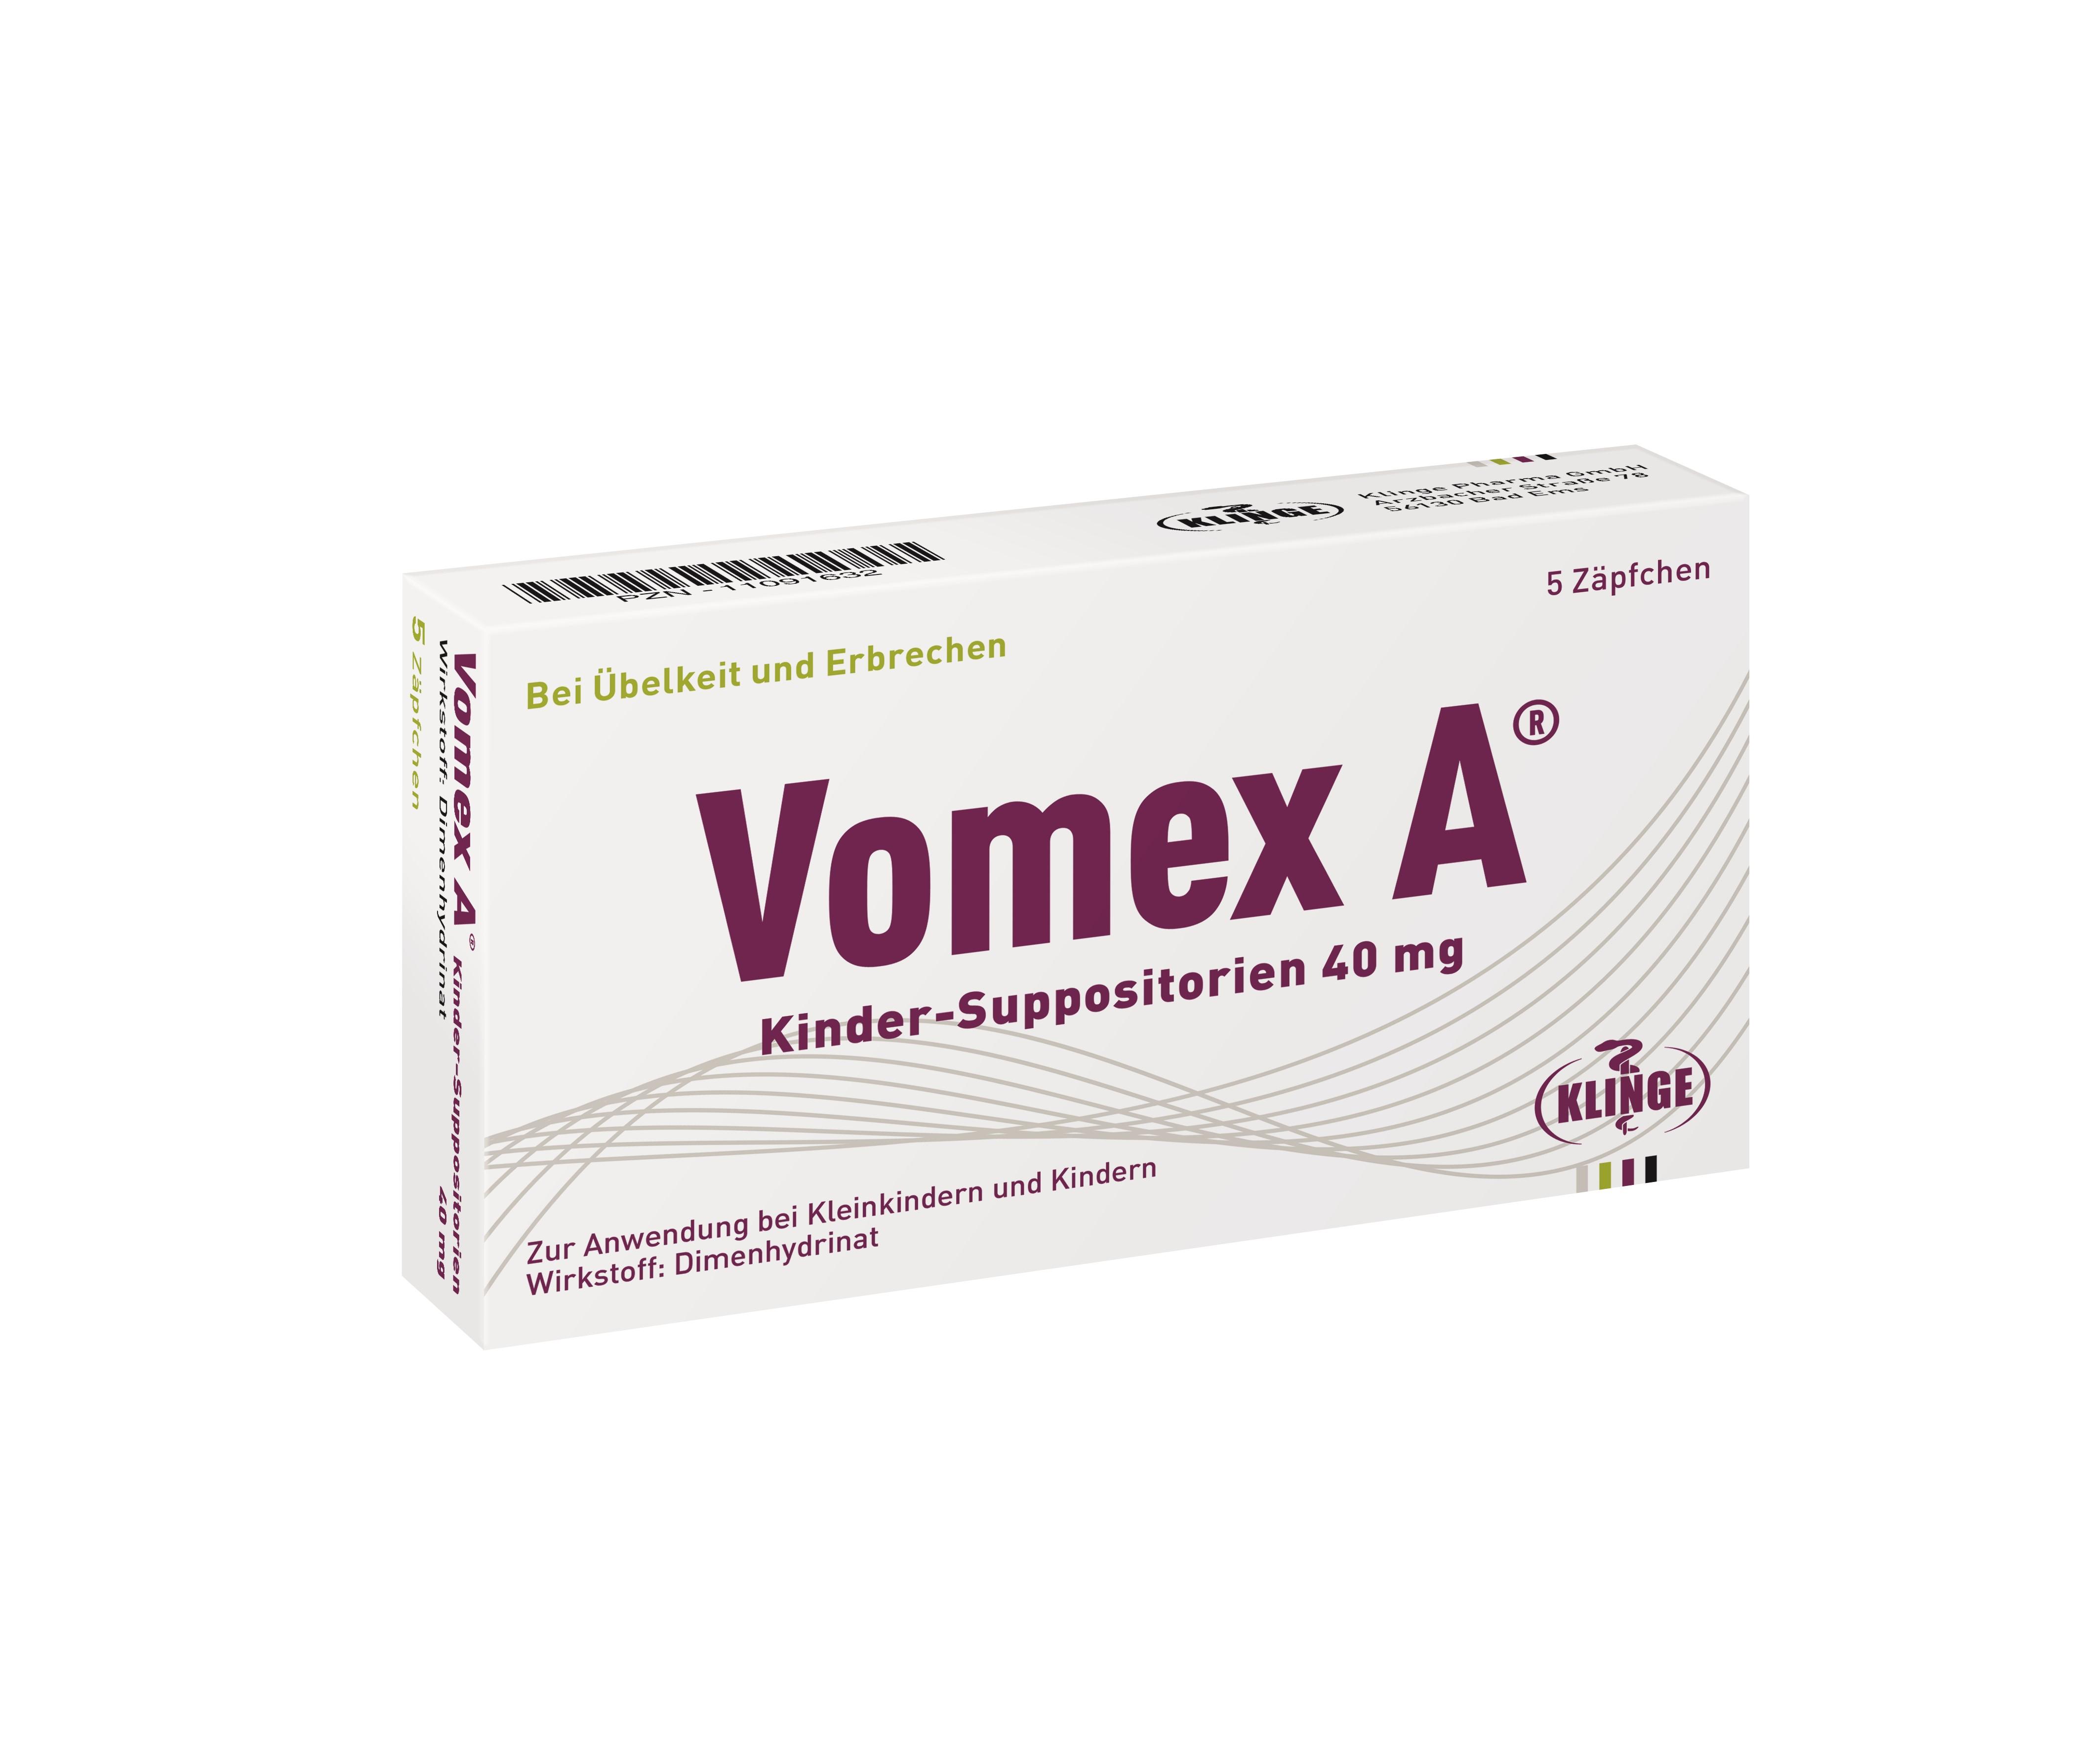 Vomex A® Kinder-Suppositorien 40mg